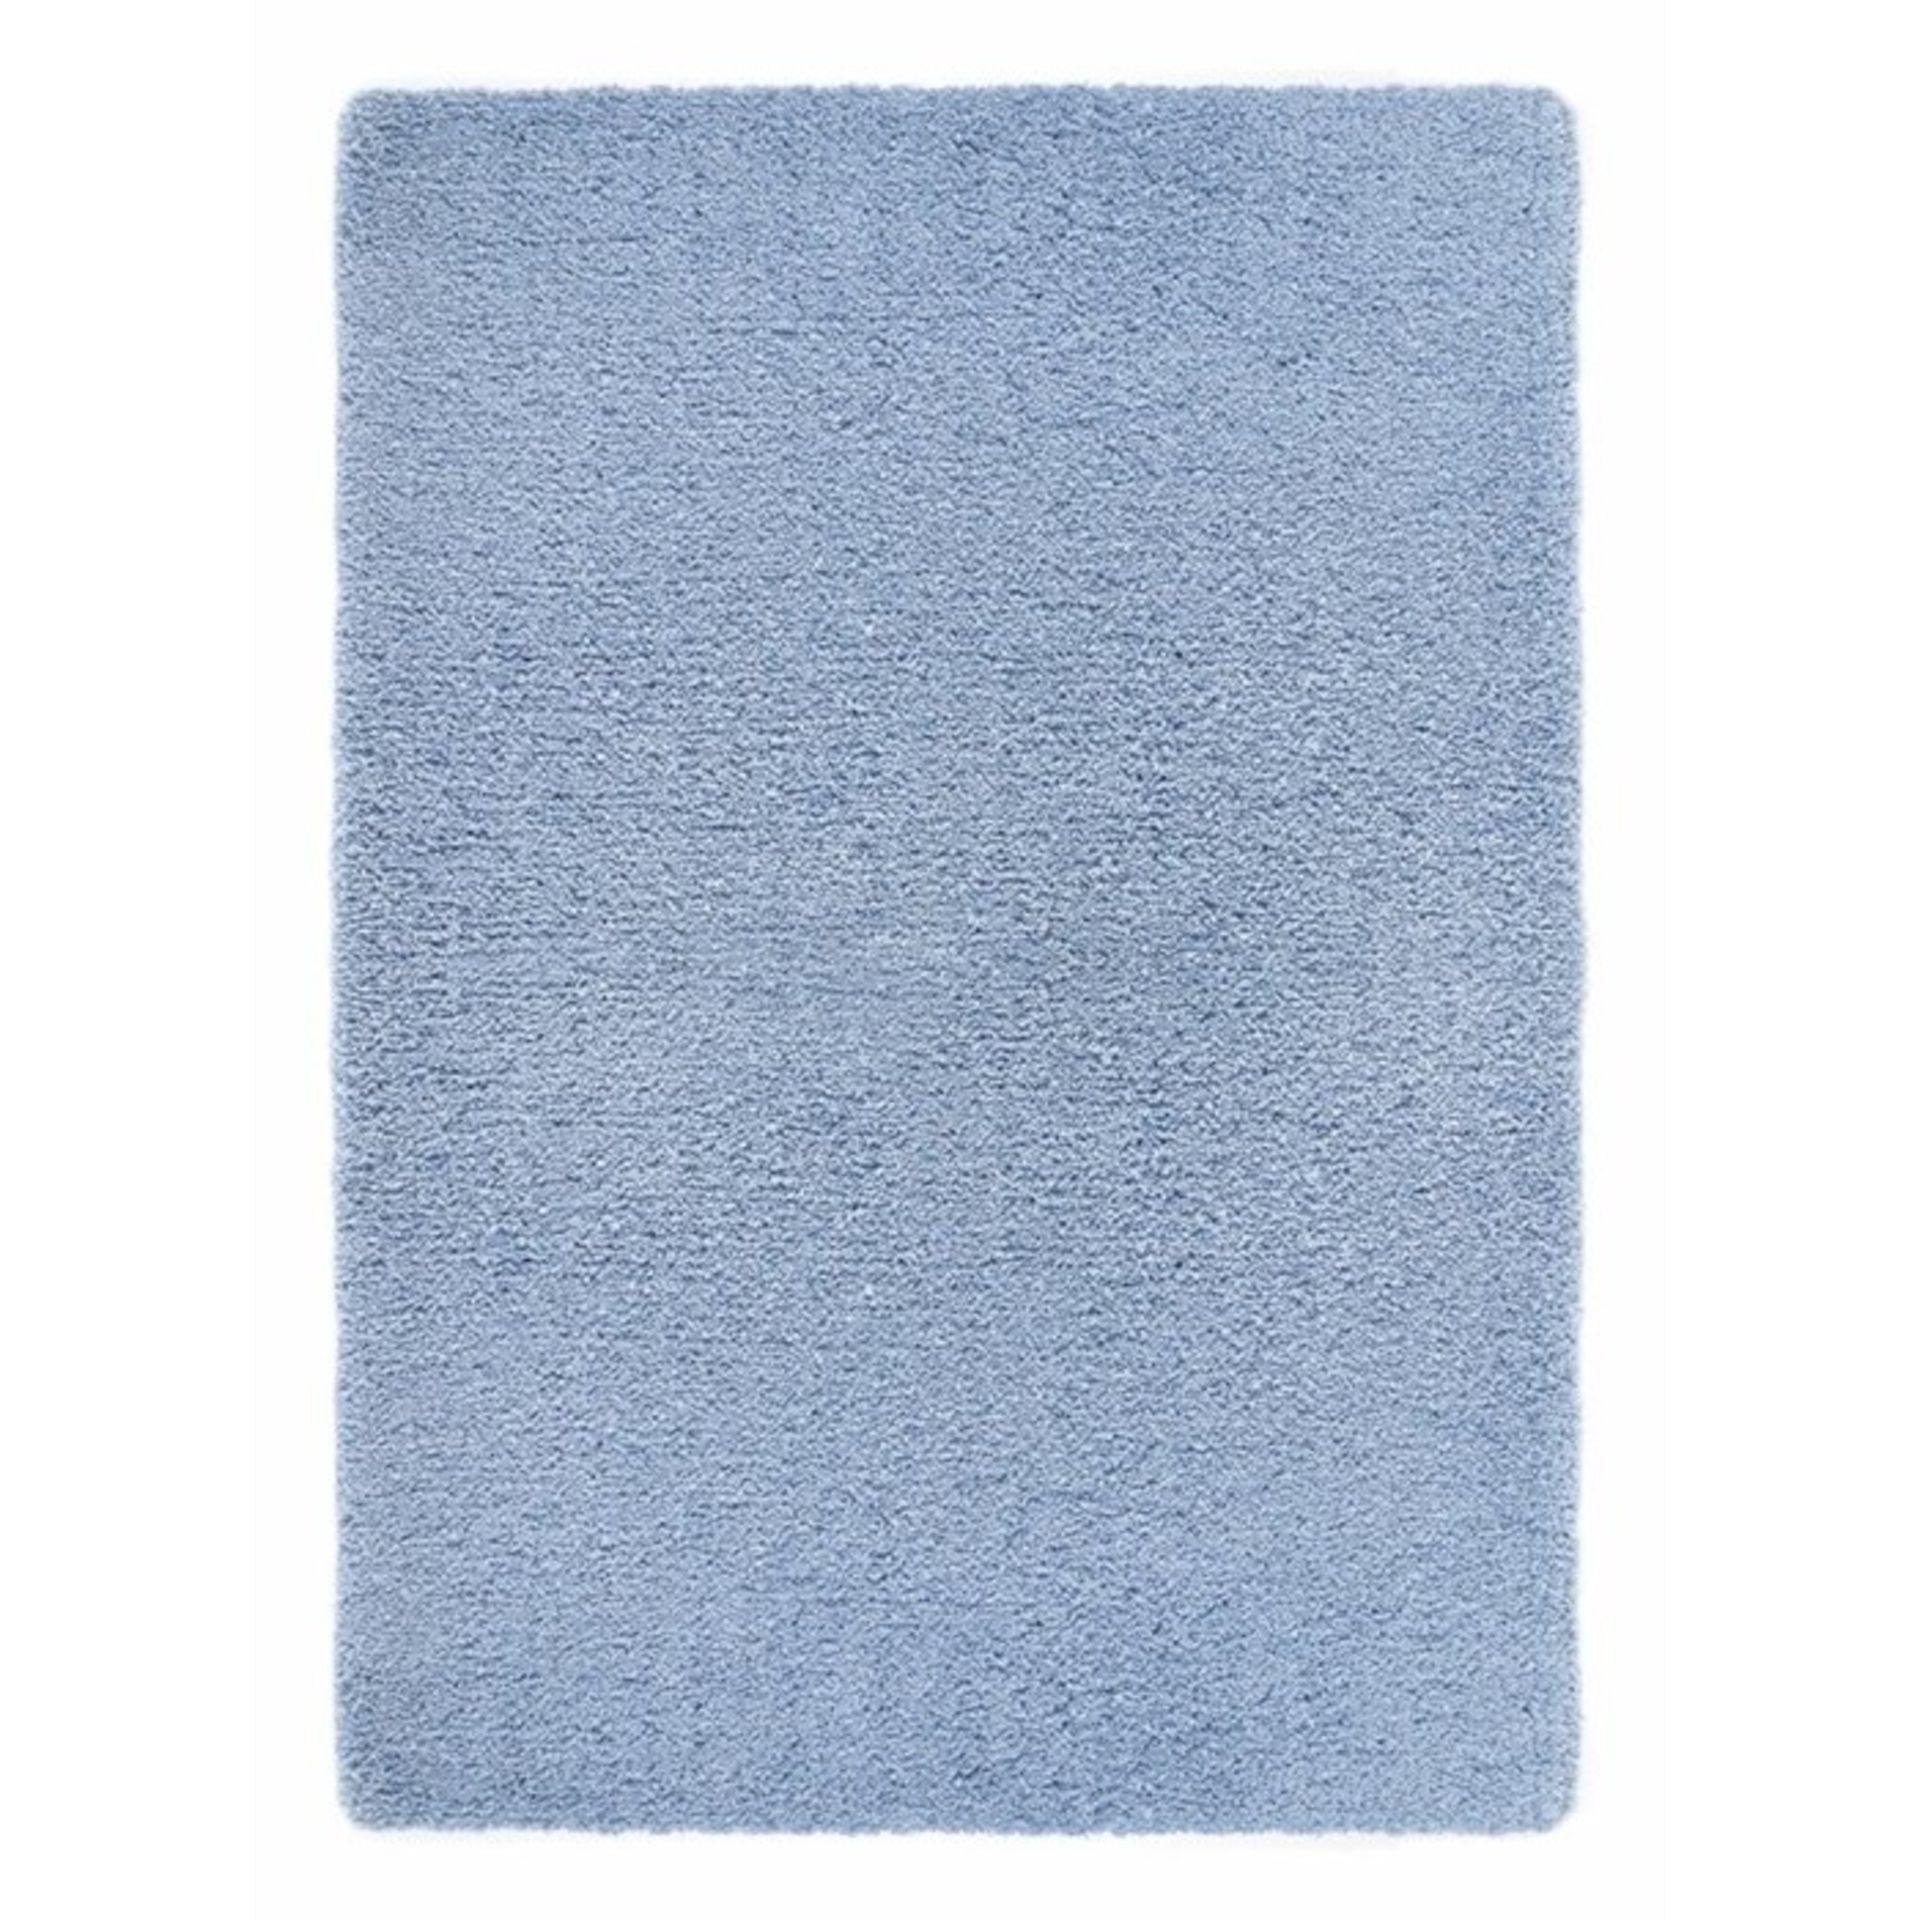 Beachcrest Home,Baywood Denim Handwoven Blue Rug (120X170CM)RRP -£ 75.99(18267/27 -BEAH1281)